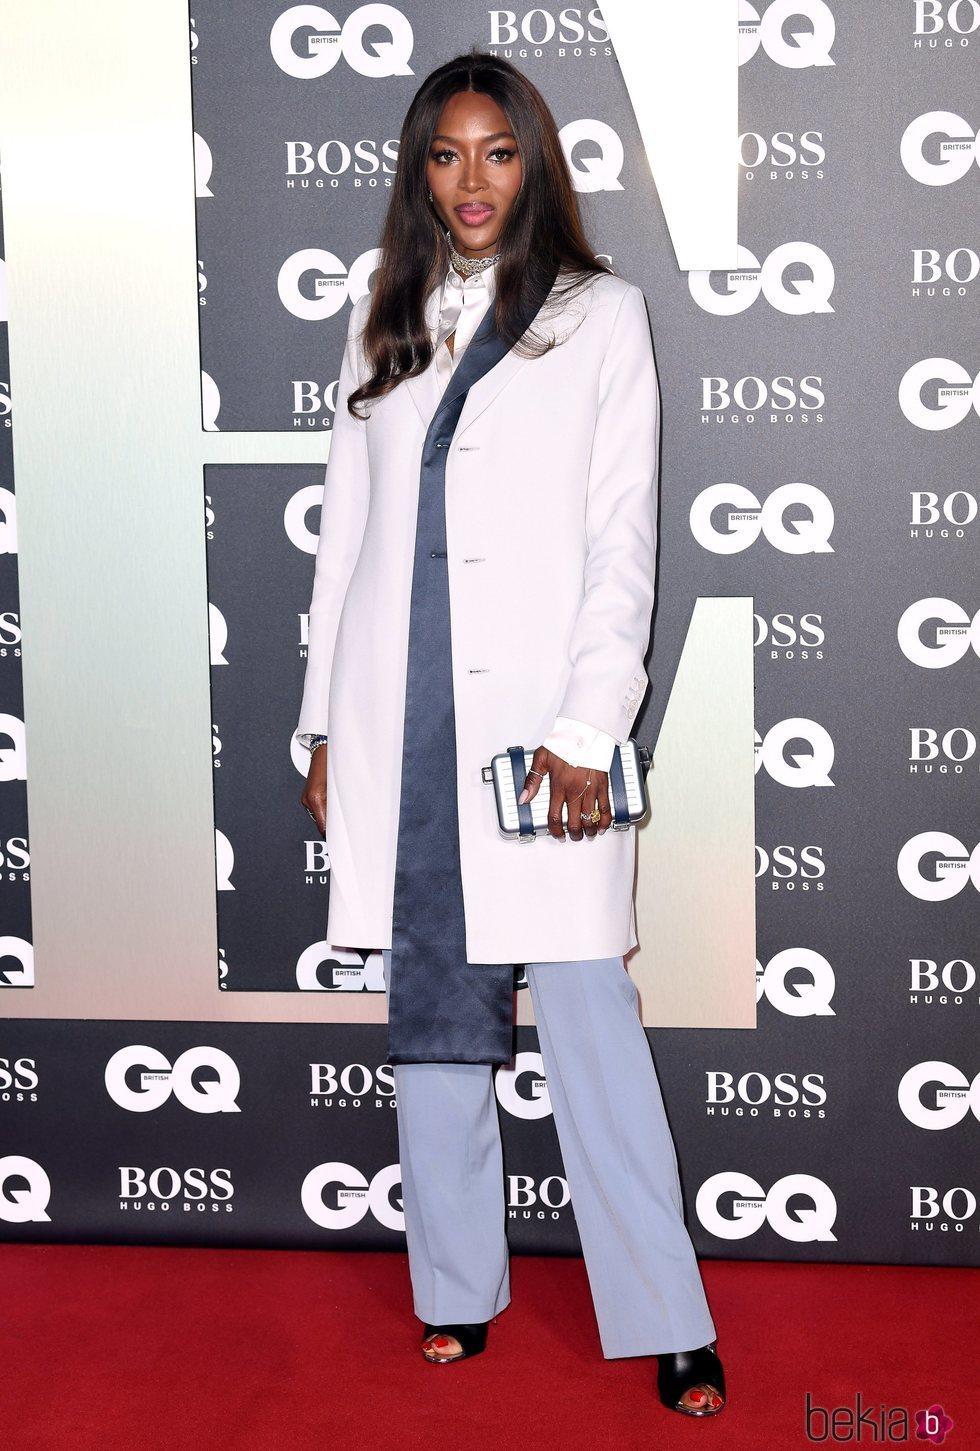 Naomi Campbell en la alfombra roja de los premios GQ 2019